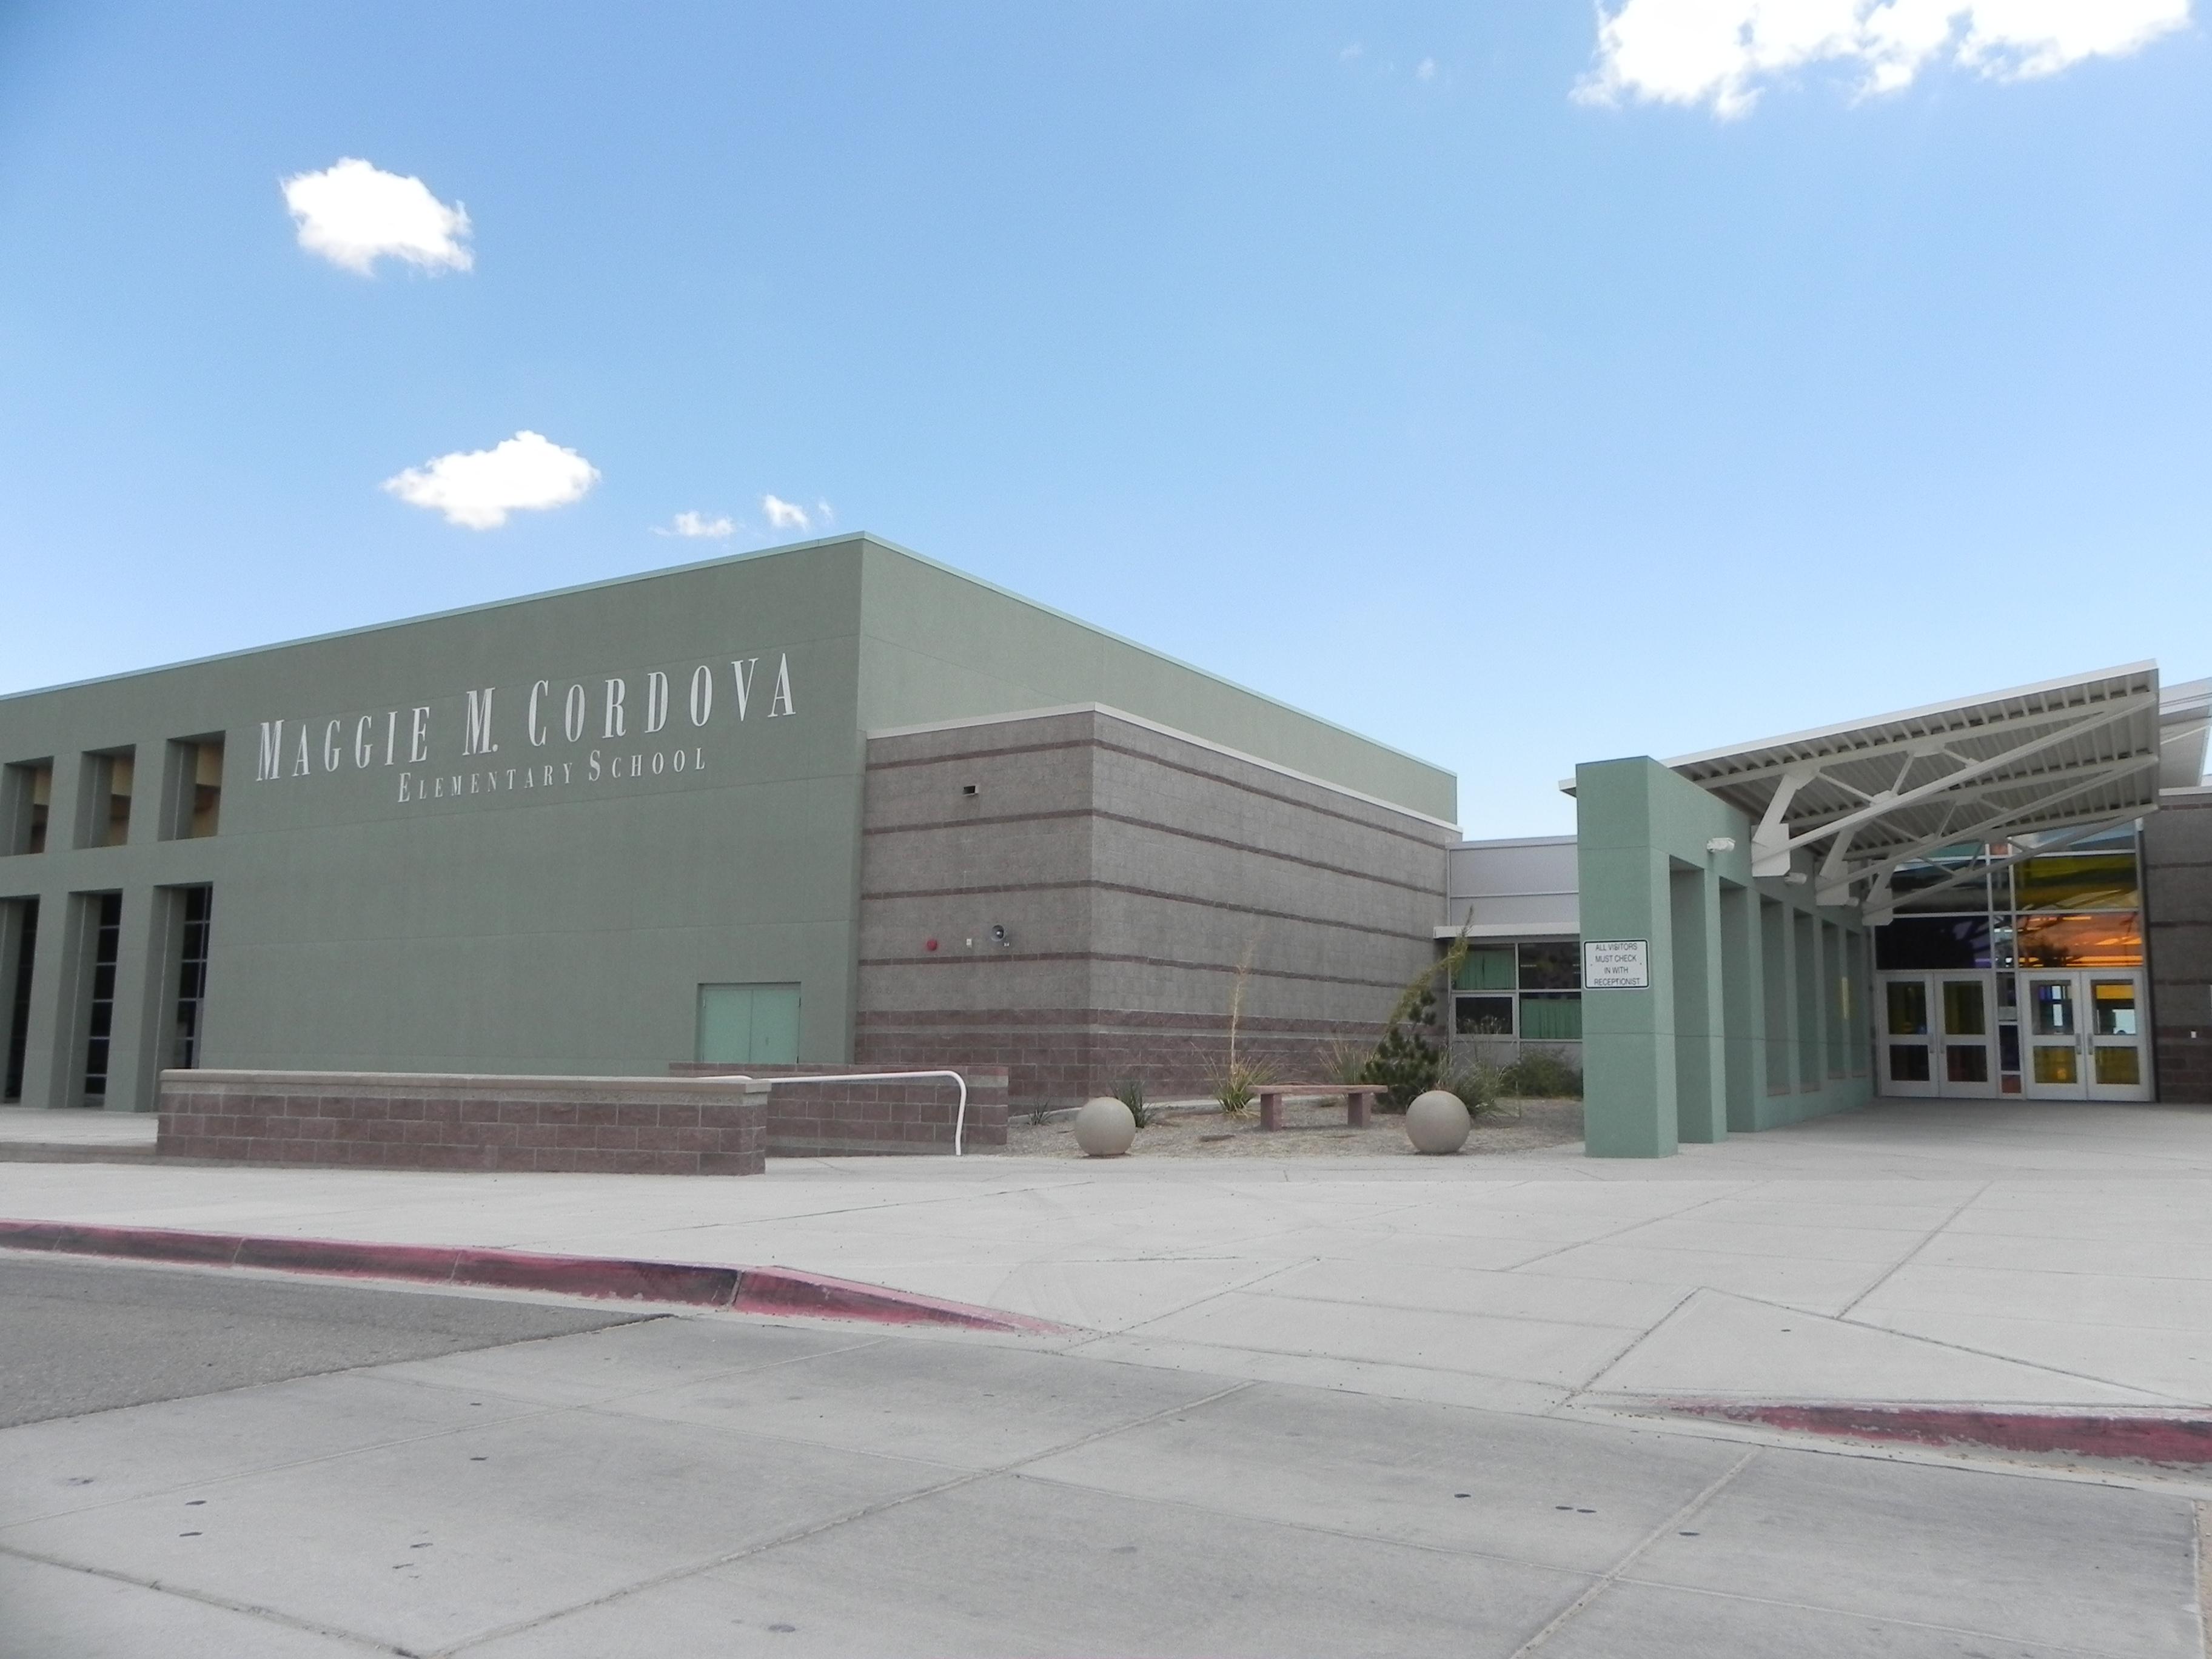 Entrance to Maggie Cordova Elementary School